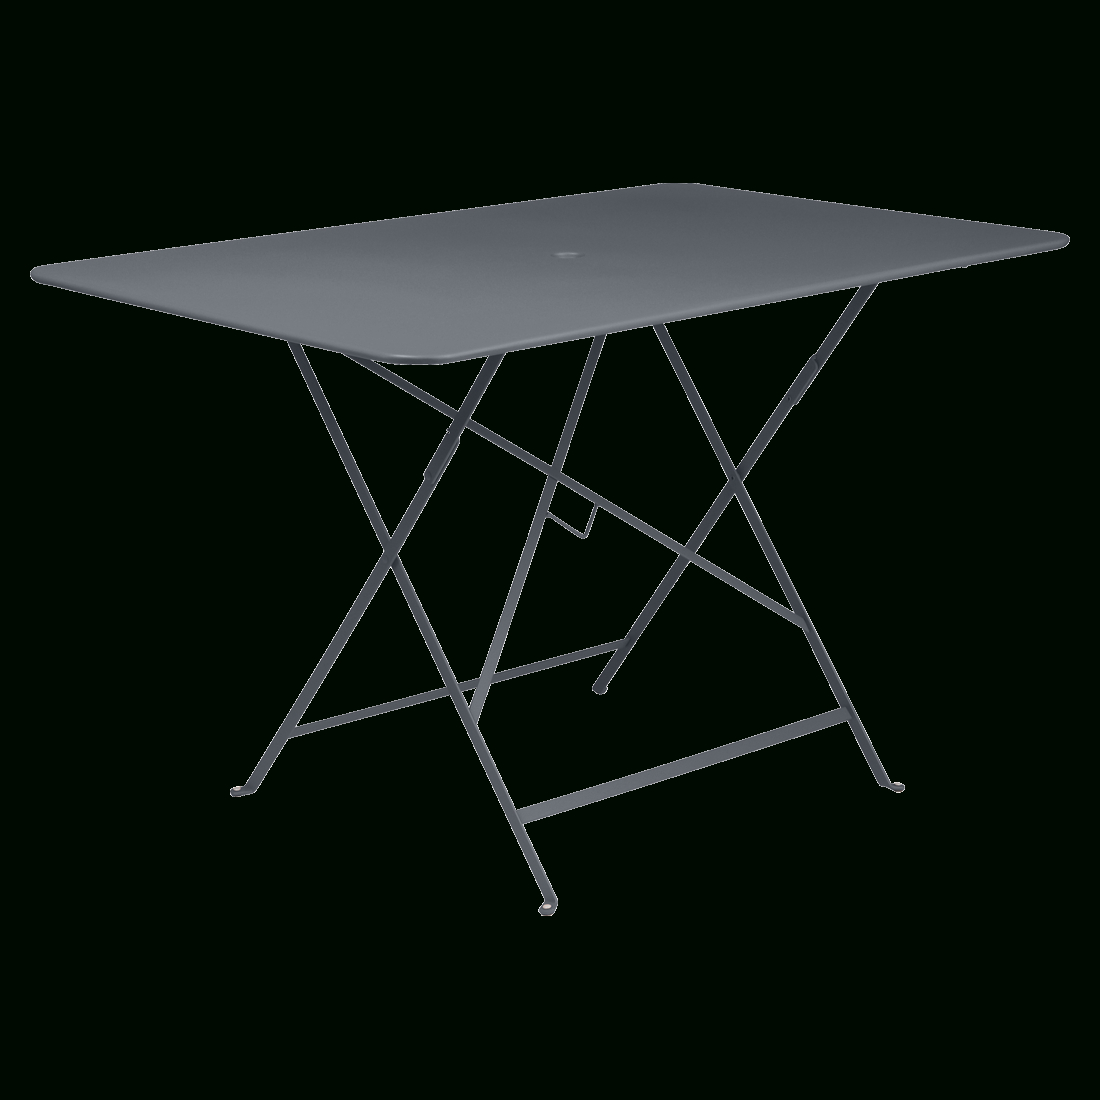 Bistro Table 117X77 Cm, Metal Table, Outdoor Furniture serapportantà Table De Jardin Metal Pliante